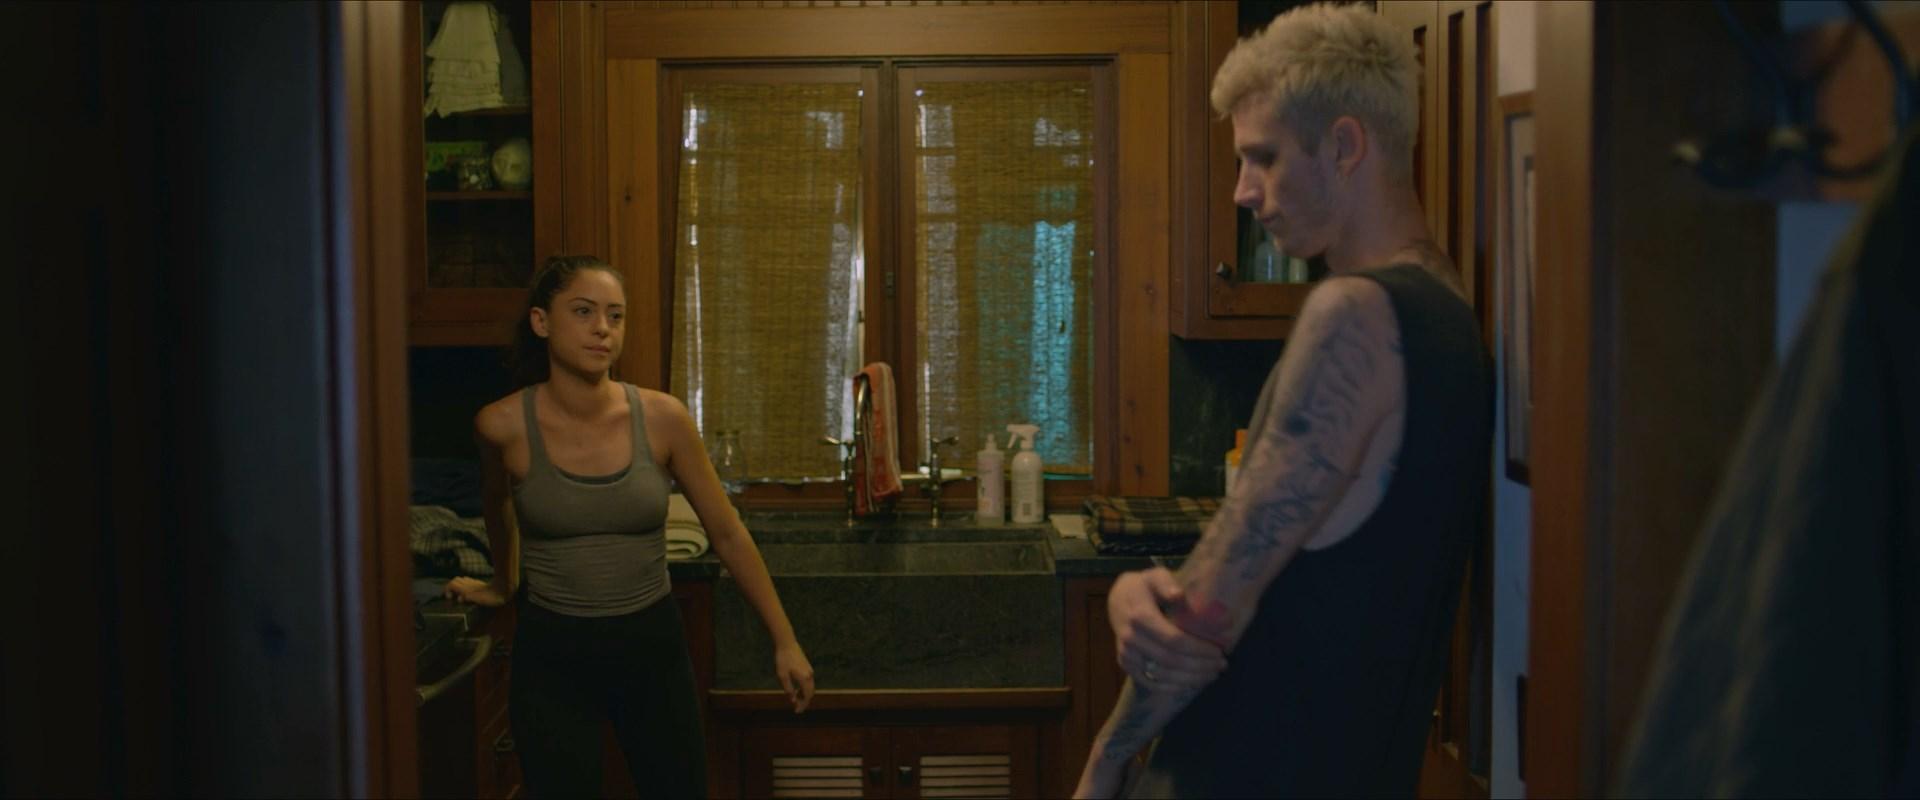 Laurie metcalf nude scene